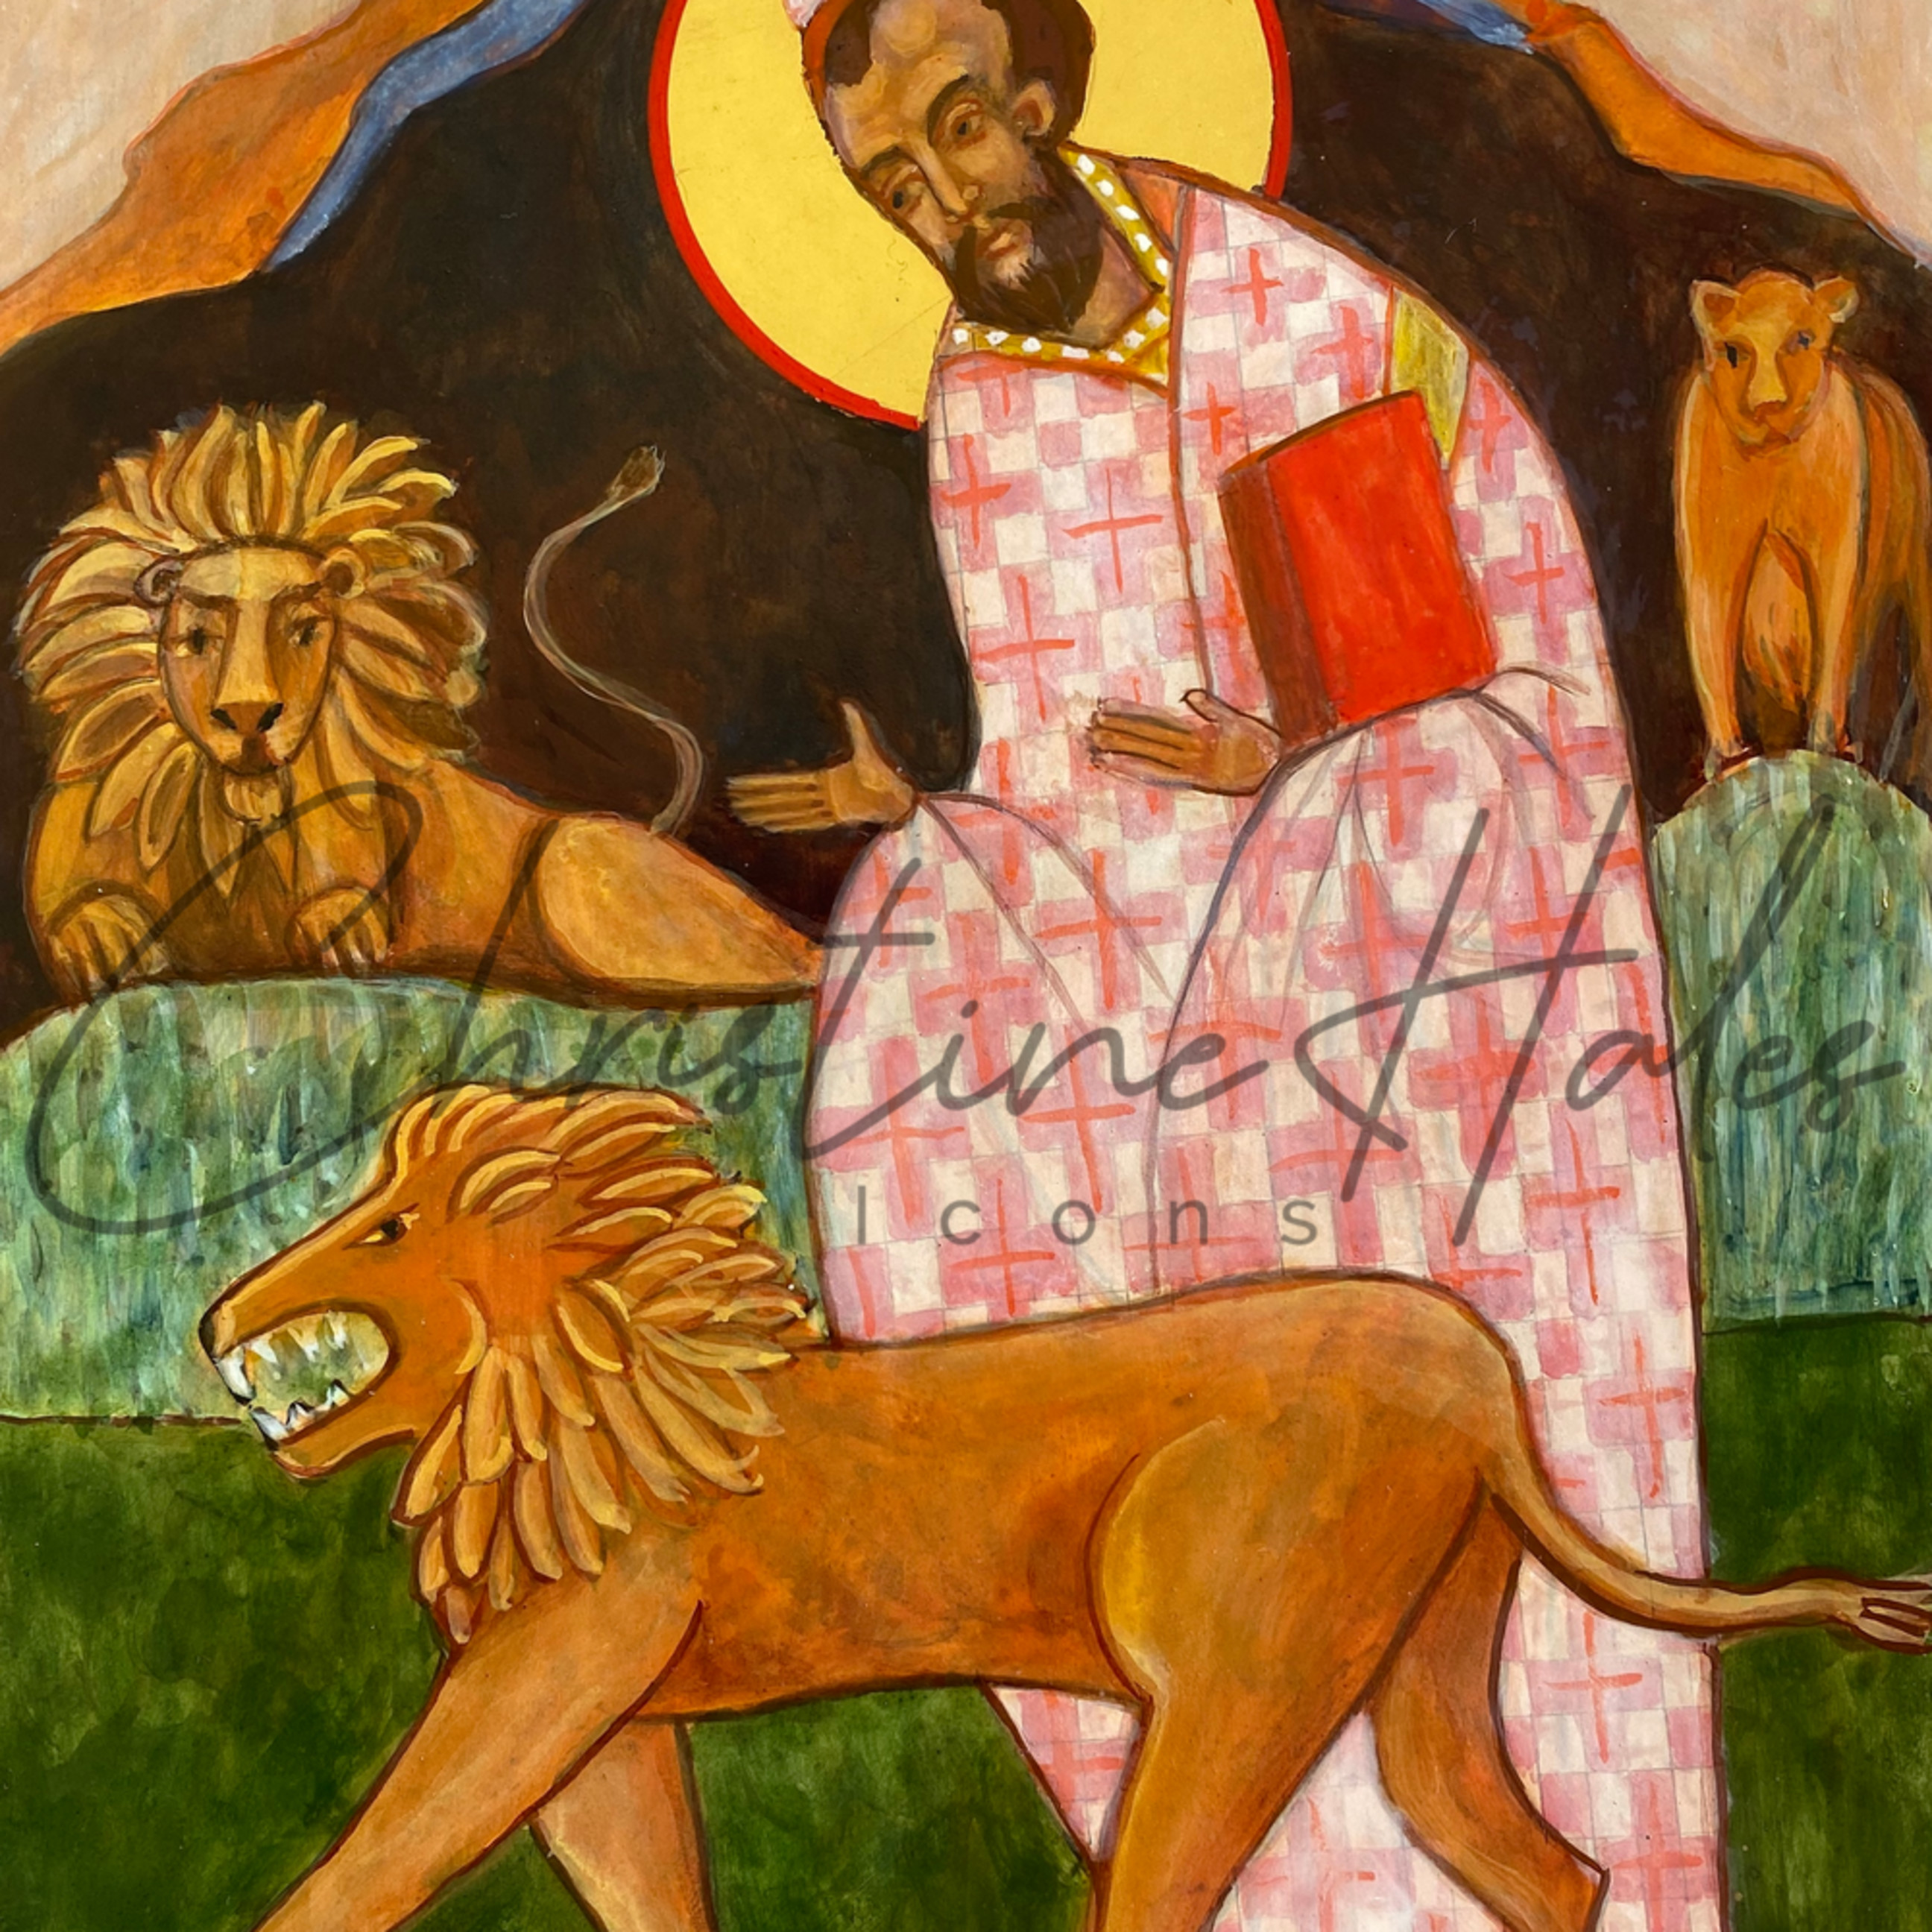 Daniel in the lion s den gzsnsn